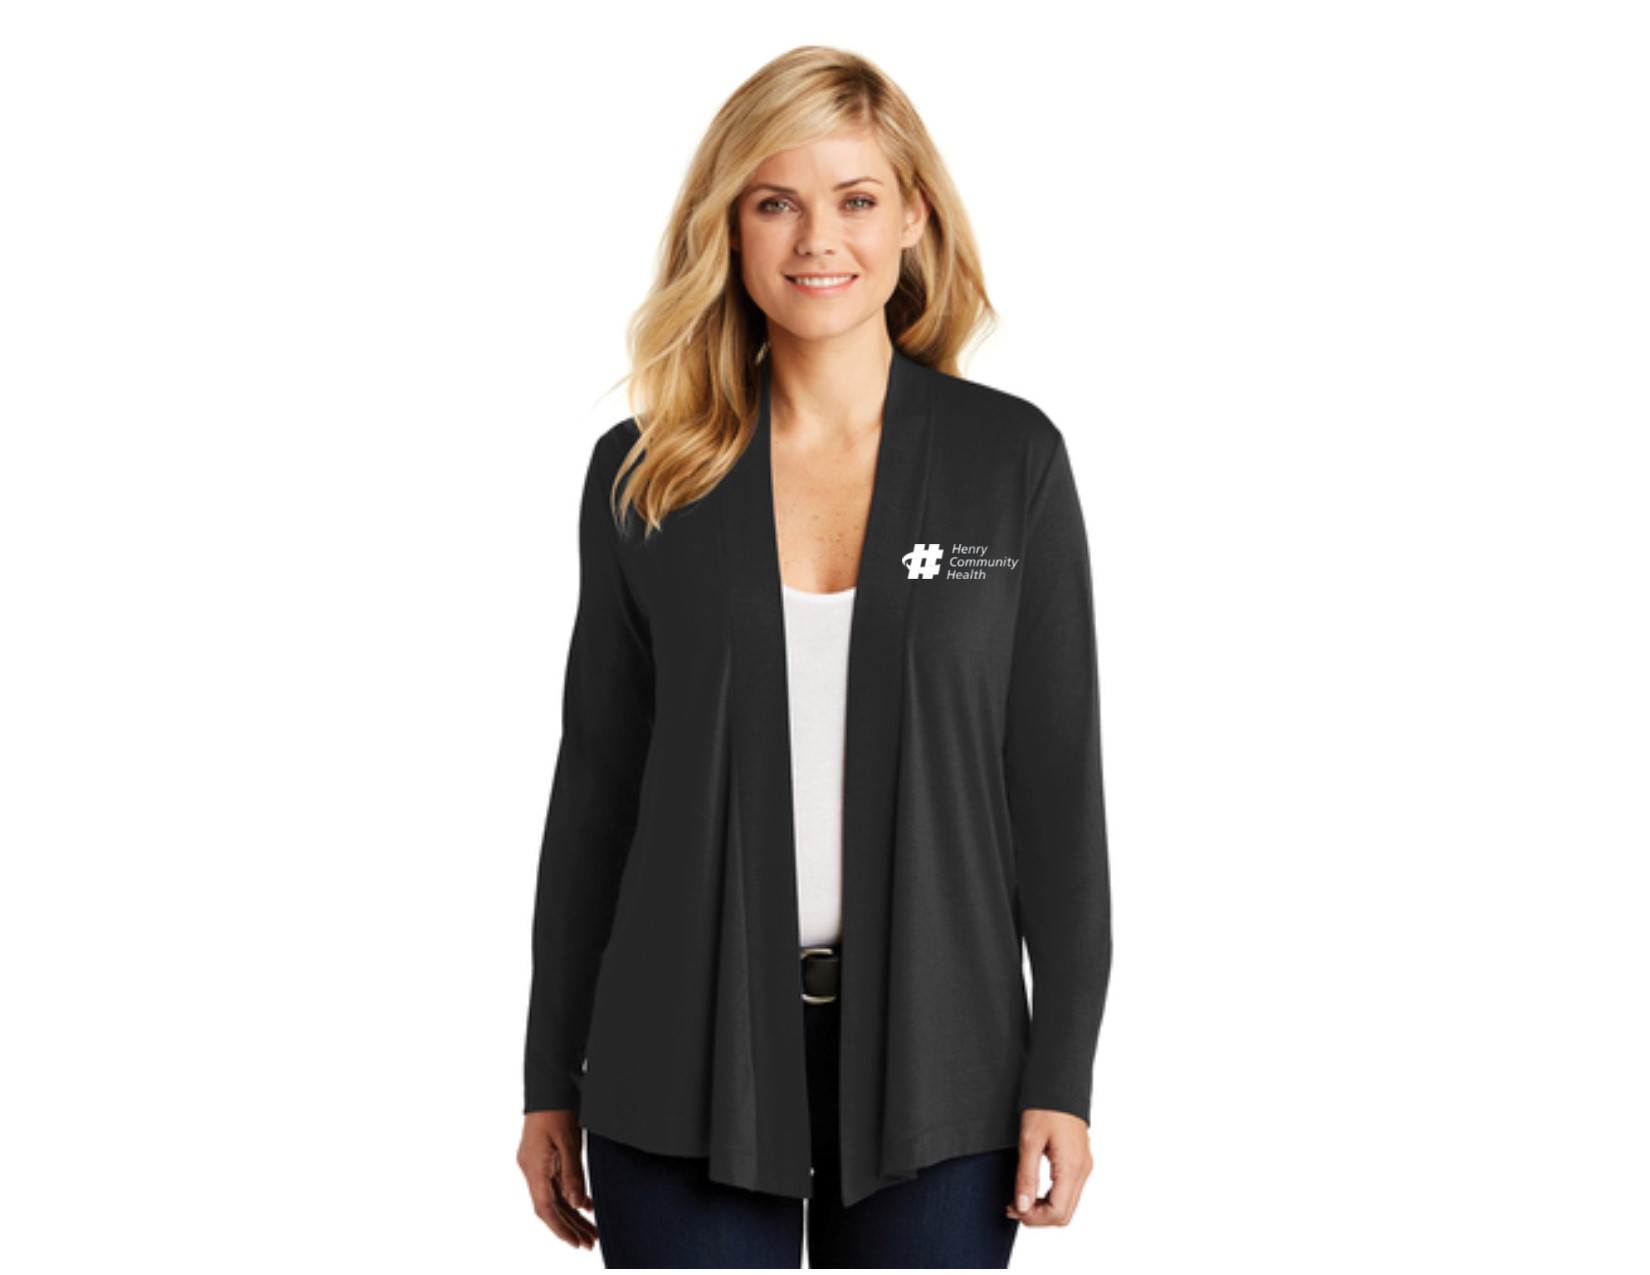 Knit Authority® Ladies Concept Cardigan L5430 Port gxwI5qCCf